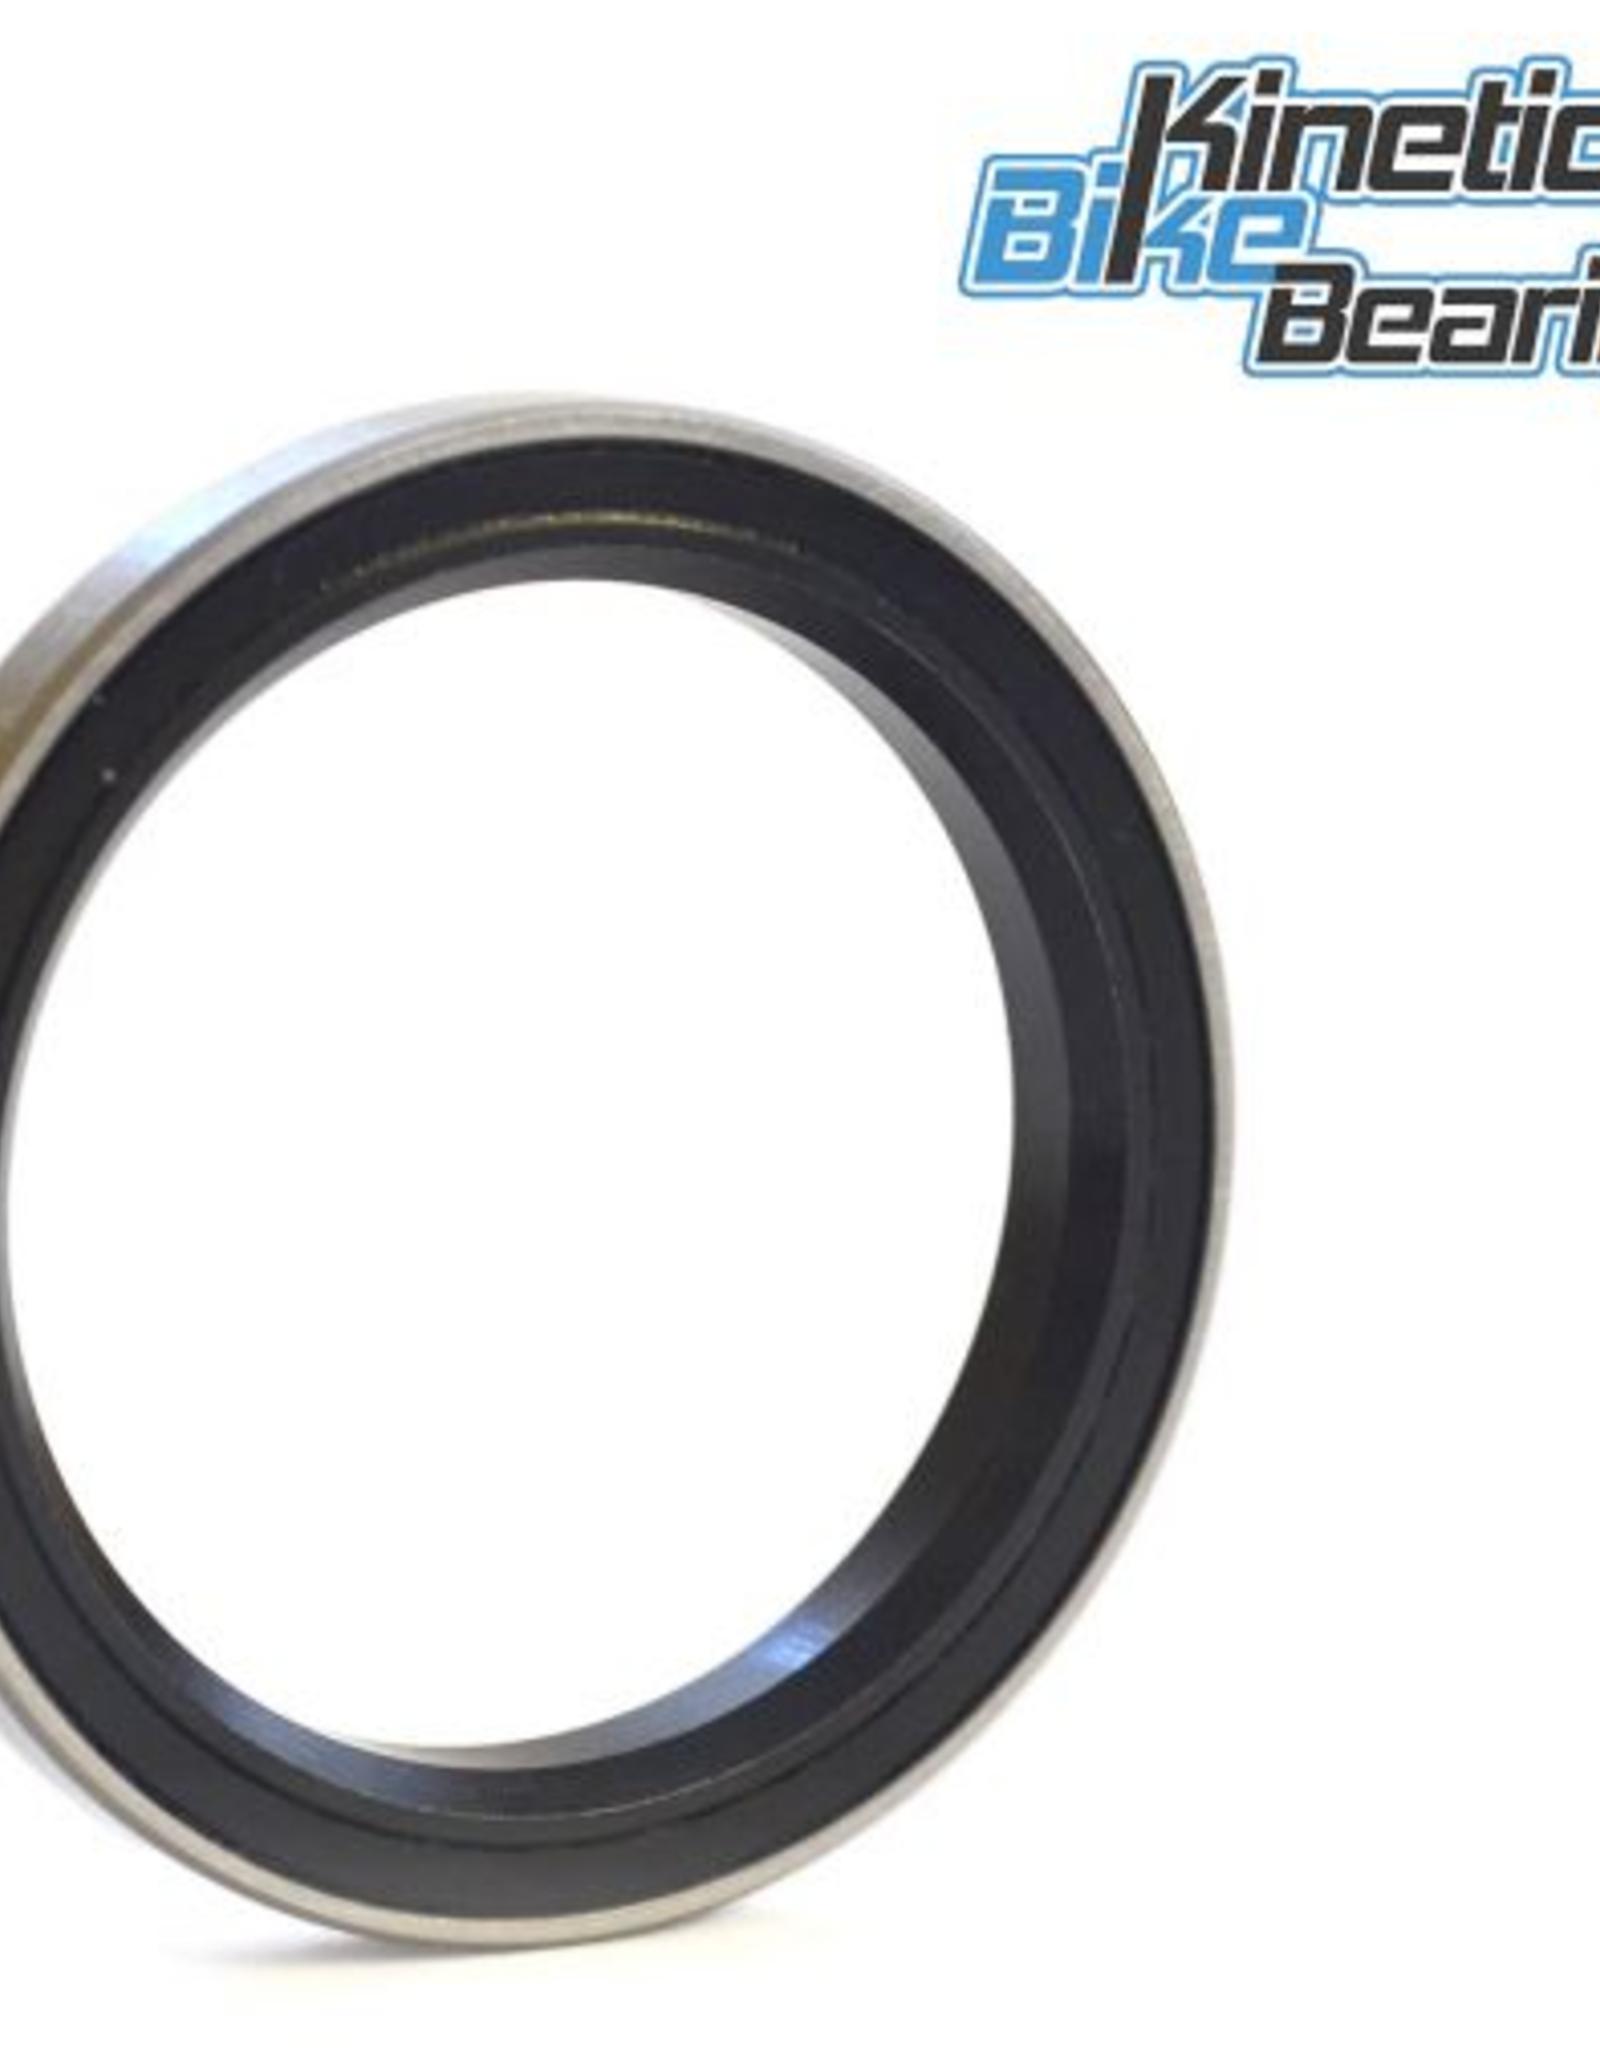 Kinetic Headset Bearing P25K 40 x 52 x 6.5mm